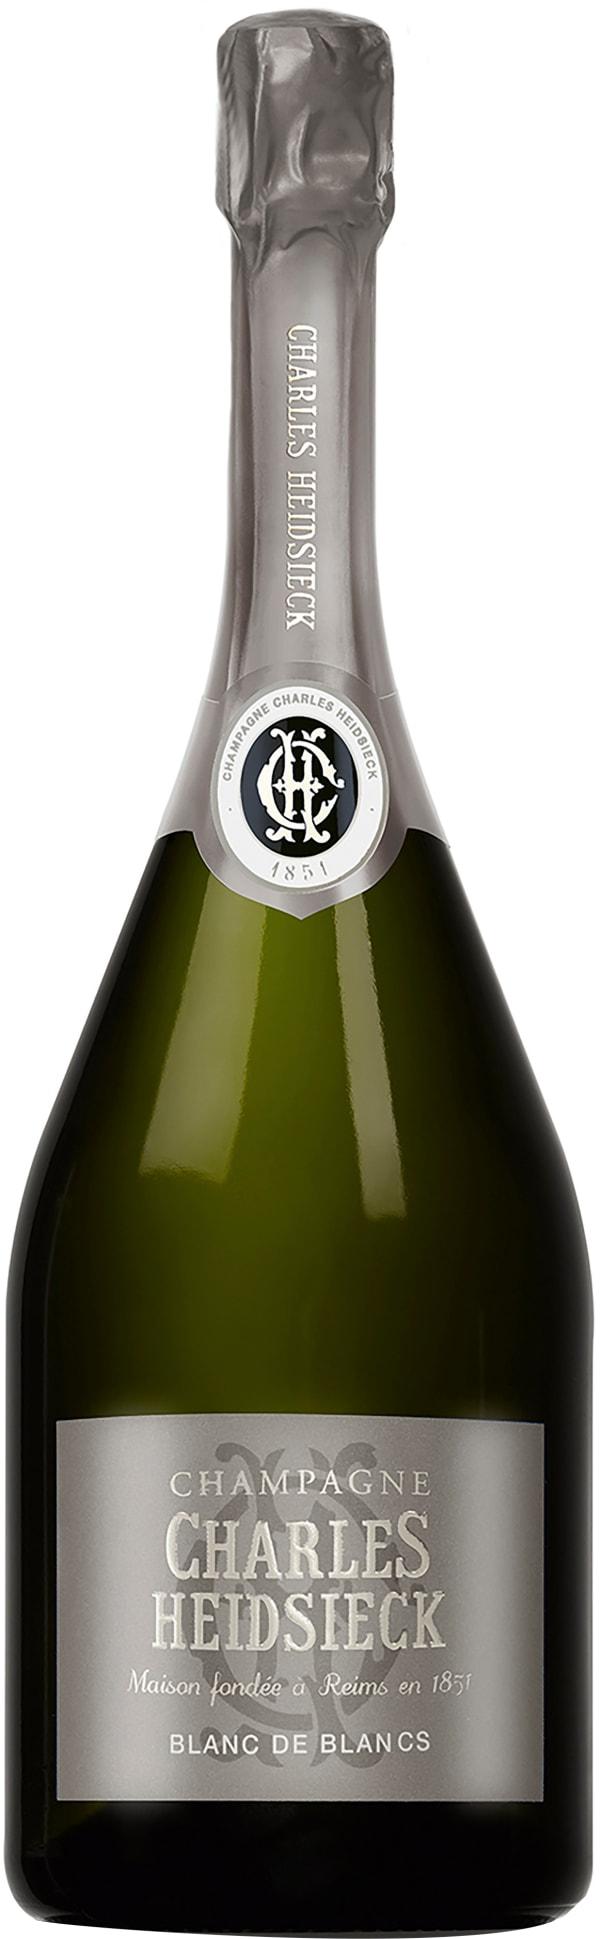 Charles Heidsieck Blanc de Blancs Champagne Brut